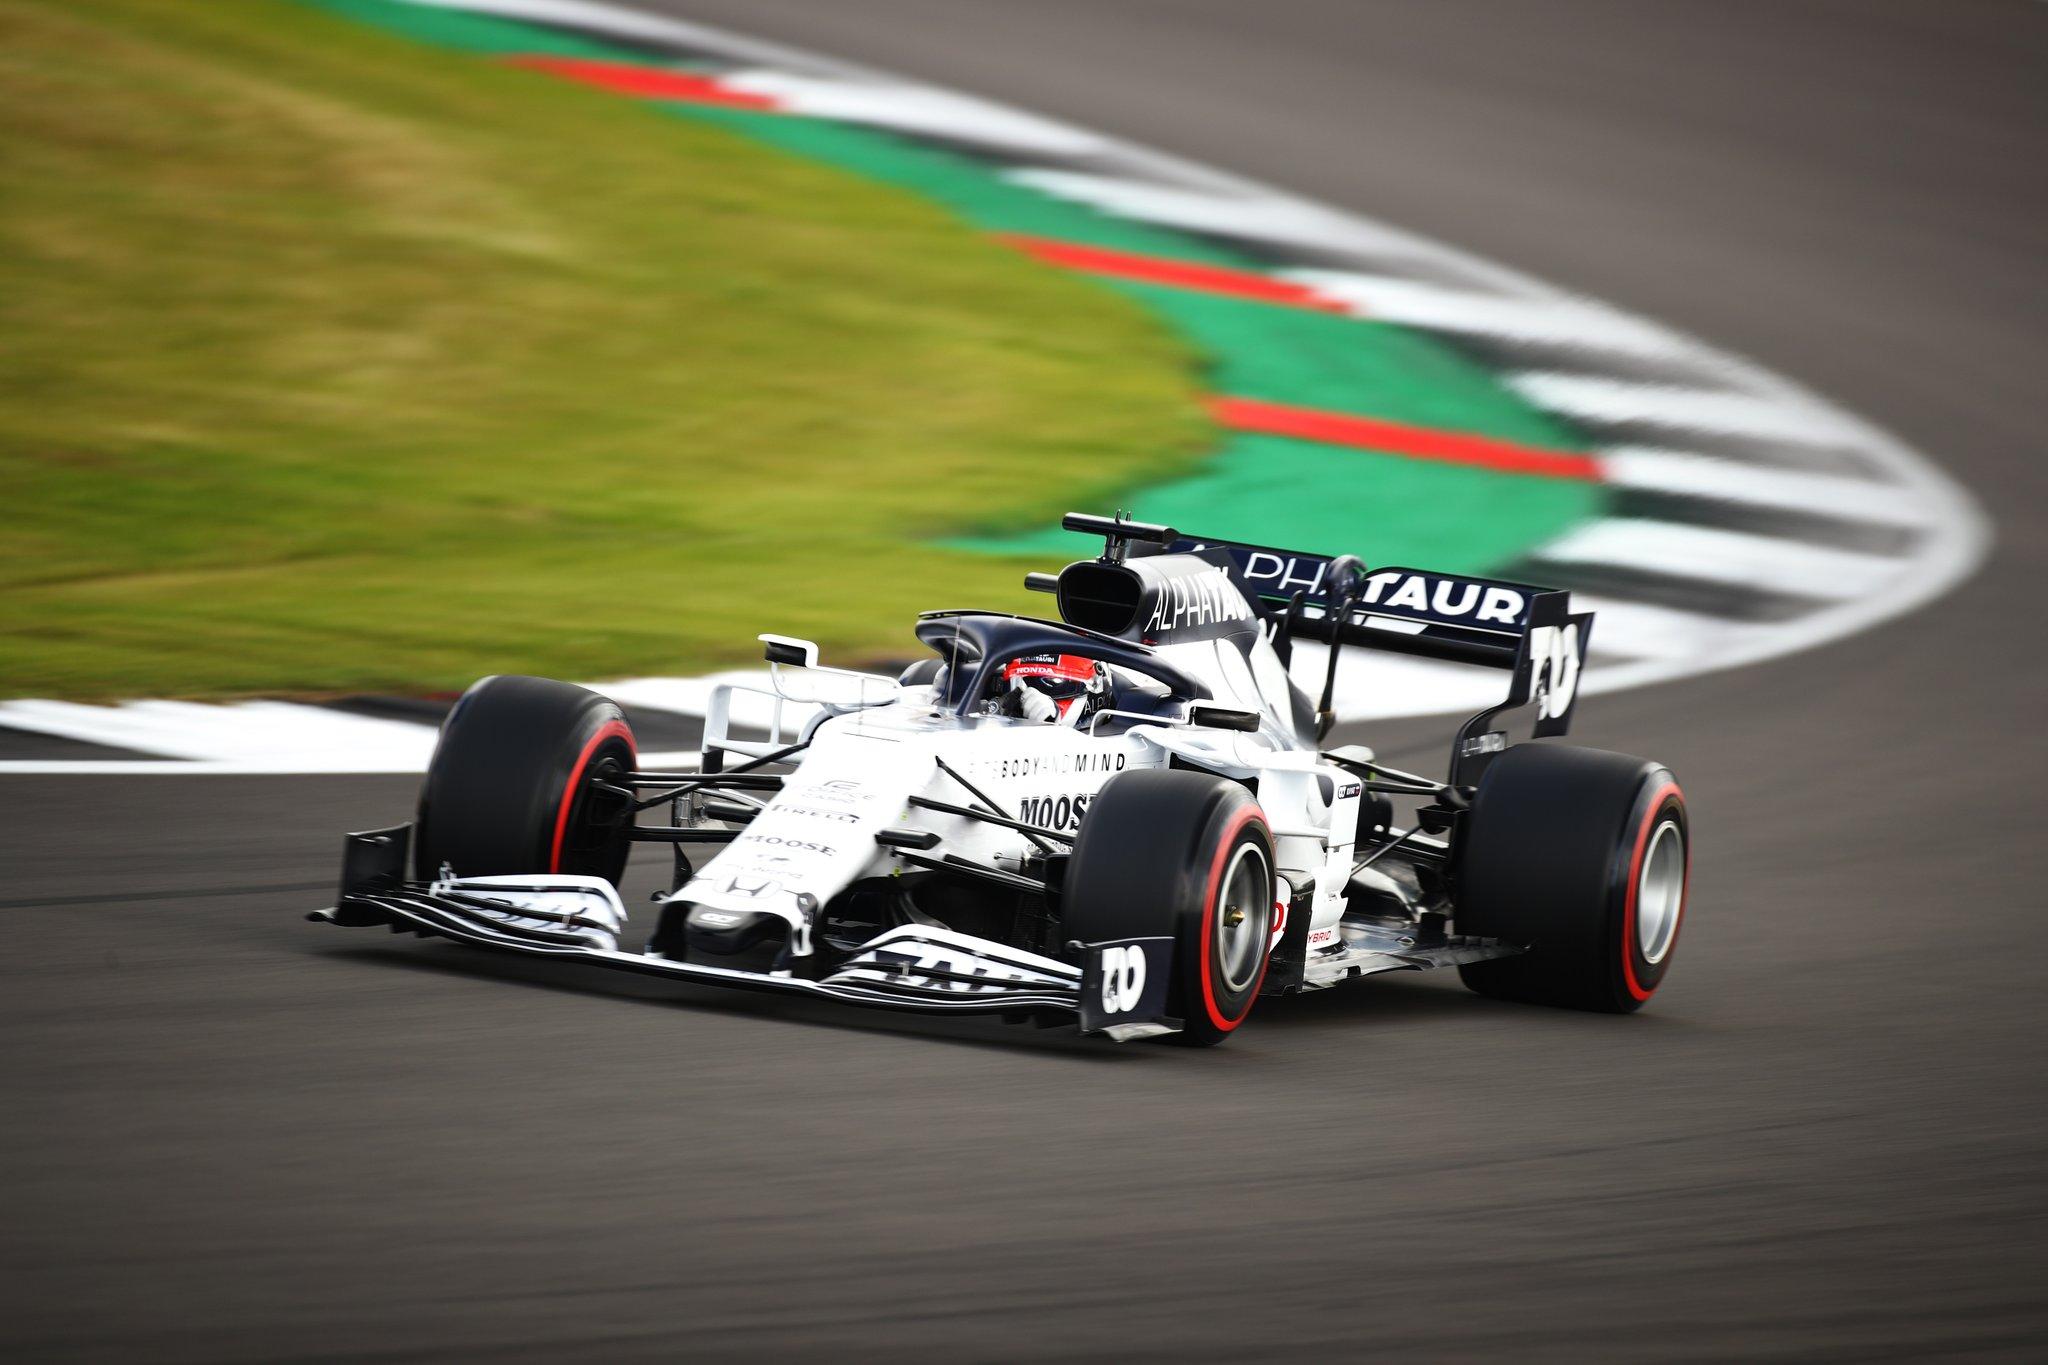 F1 - Pirelli met hors de cause son pneu dans le crash de Daniil Kvyat